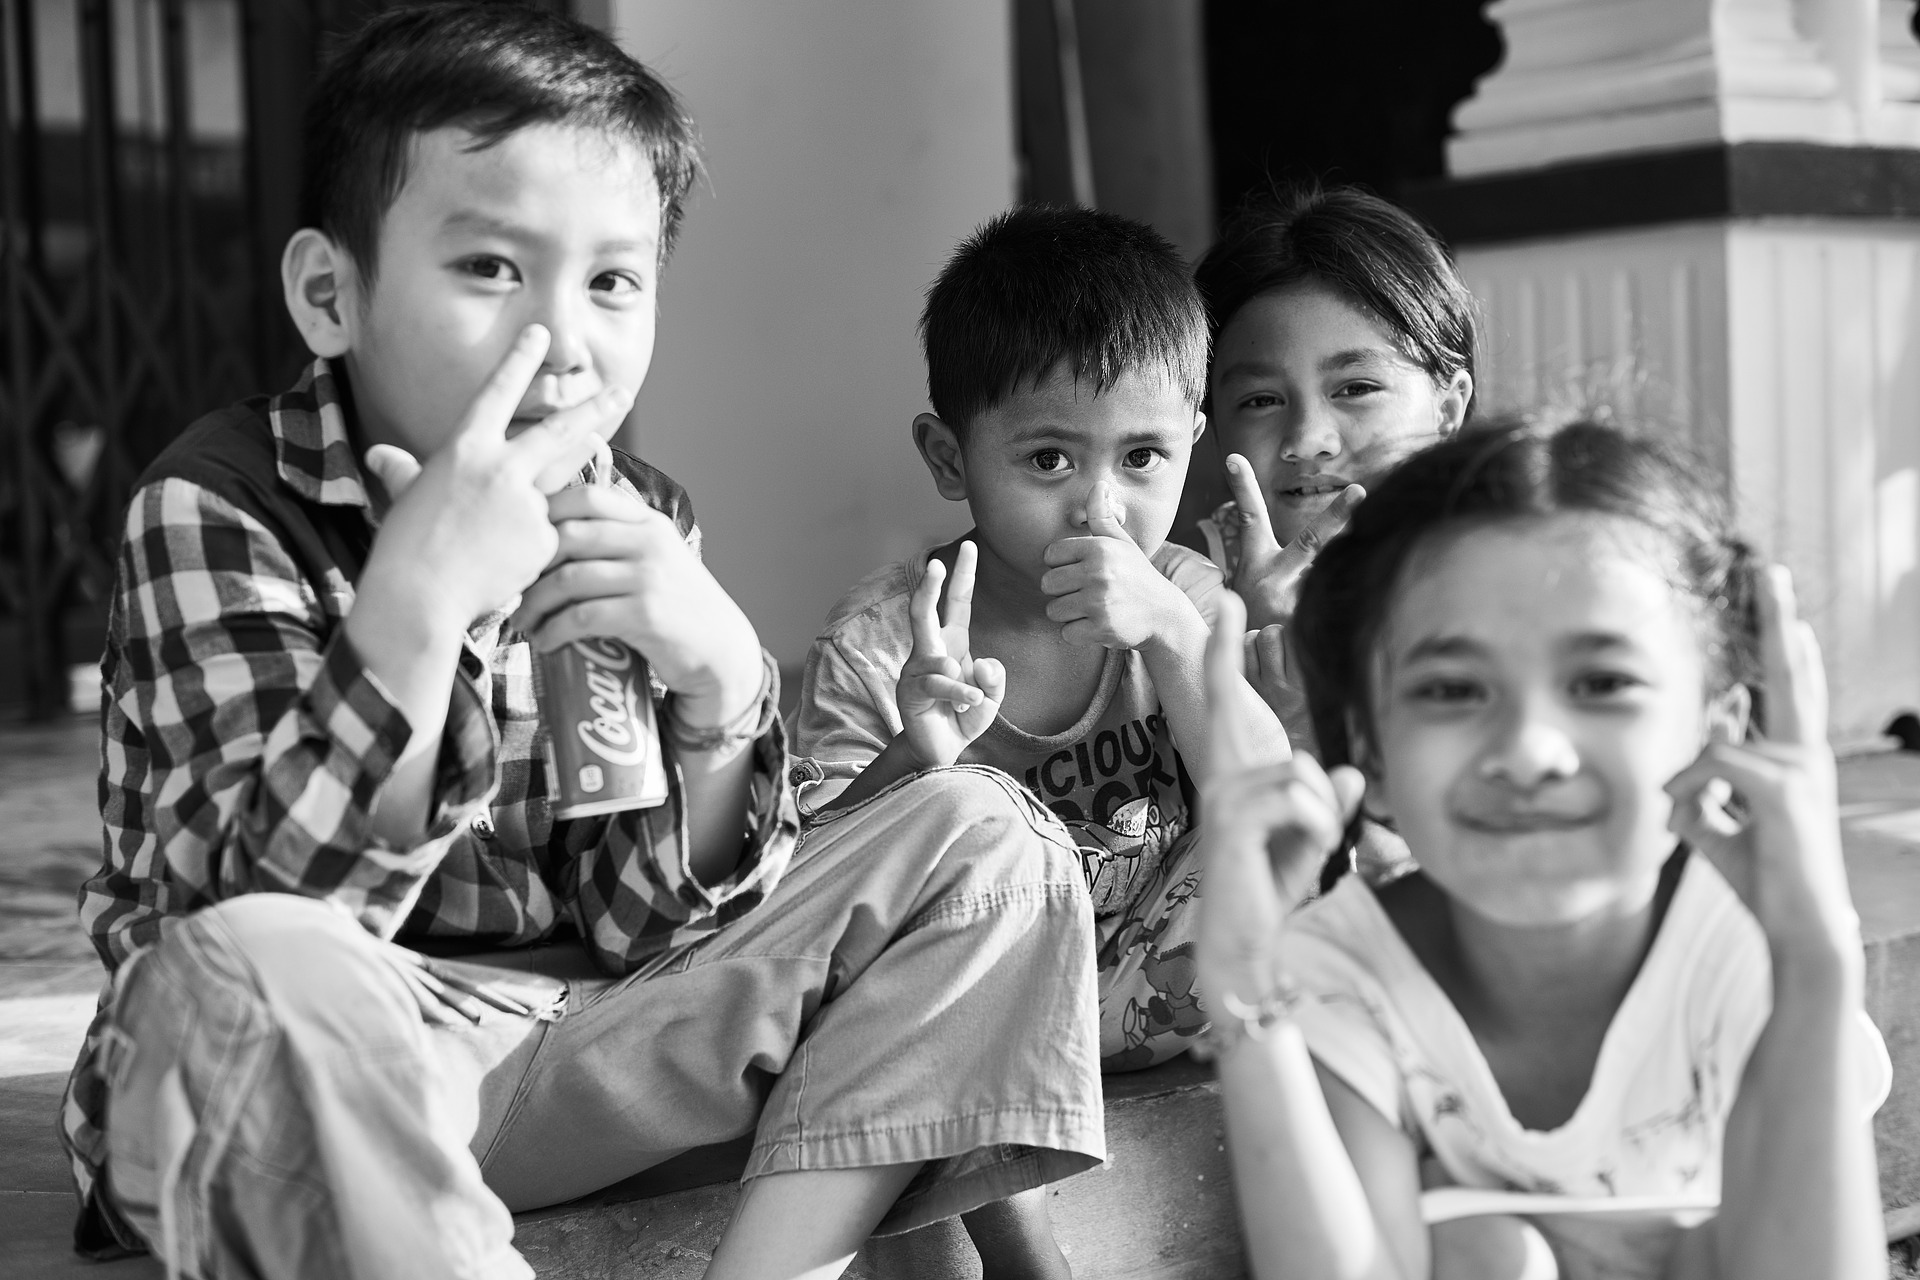 cambodia-3222522_1920.jpg